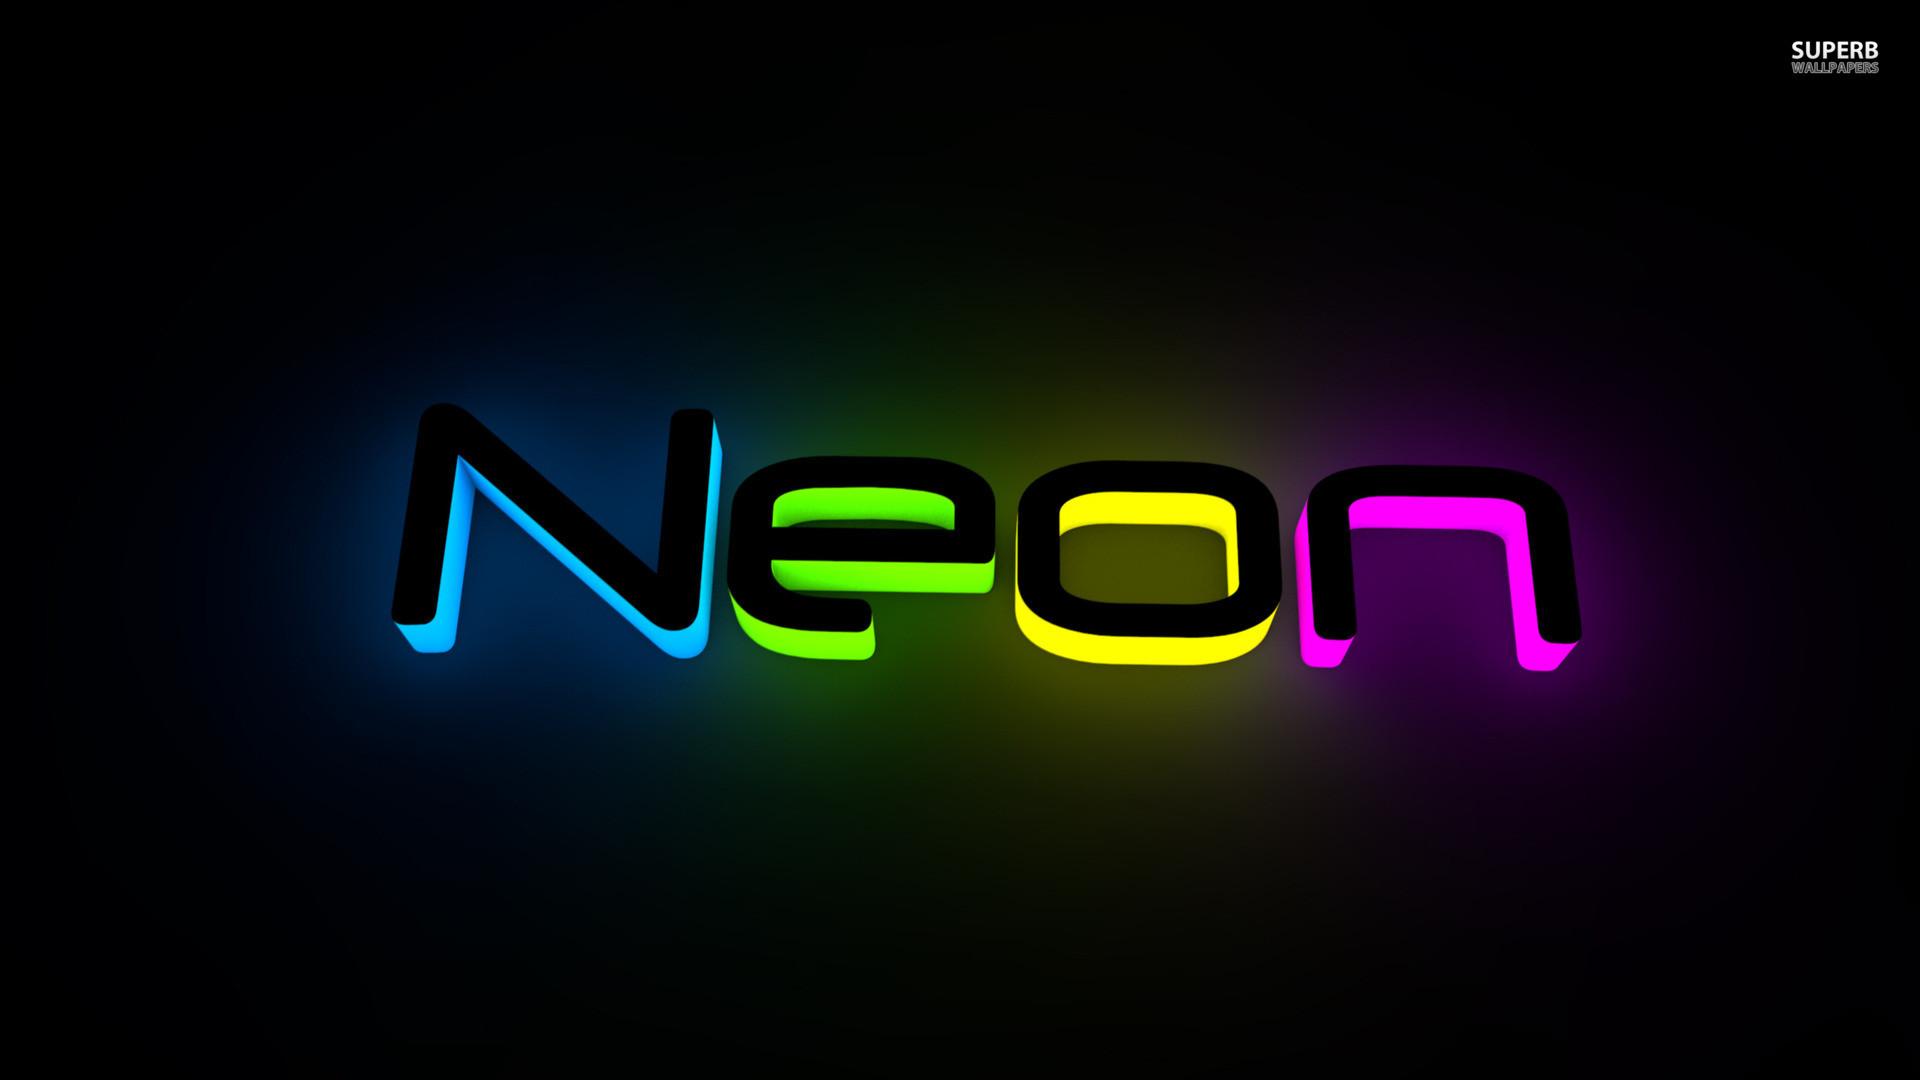 neon wallpapers by InukaiChan   Peanut   Pinterest   Neon wallpaper and  Wallpaper